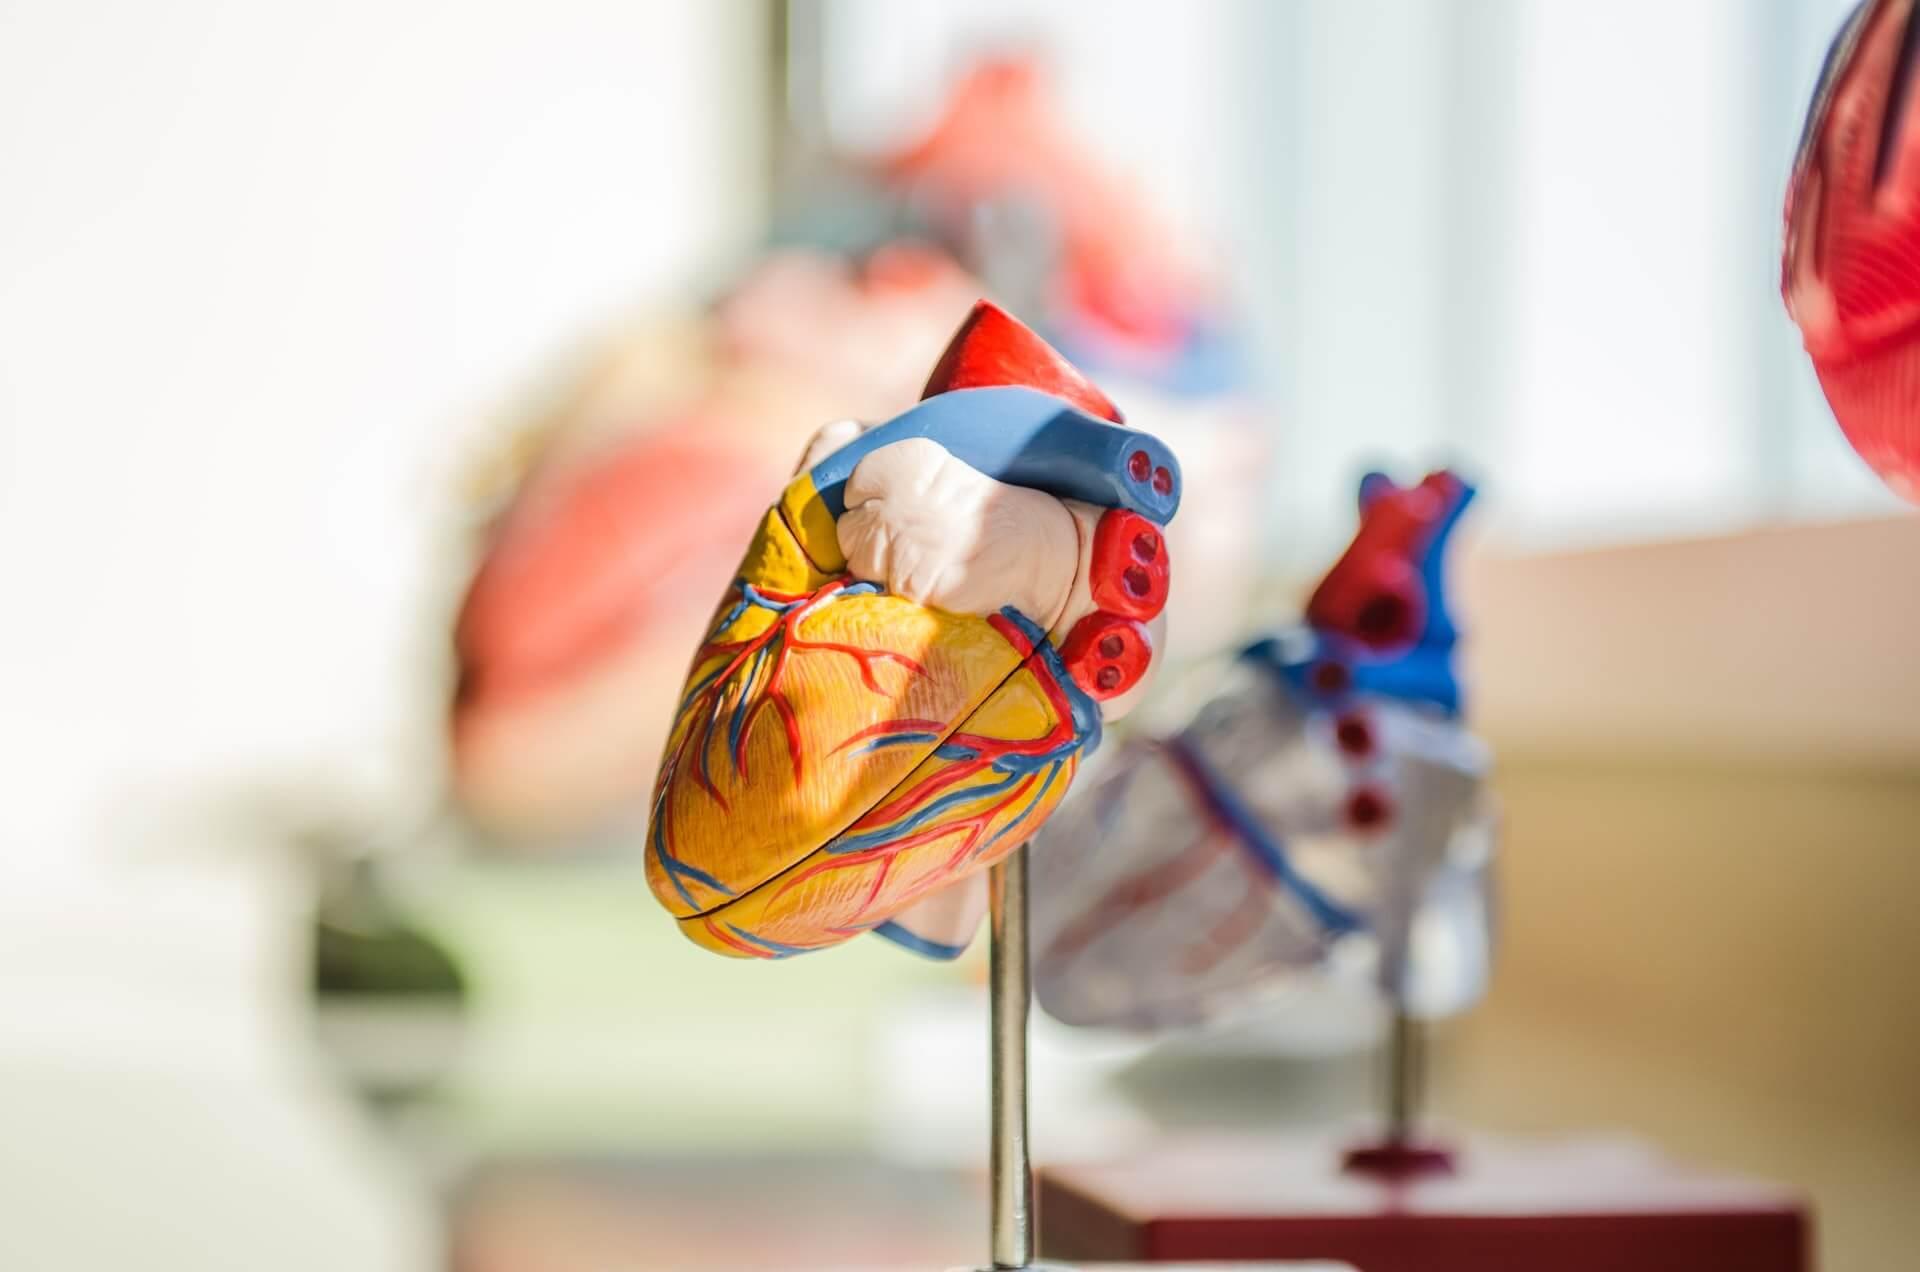 Photo of a heart organ model